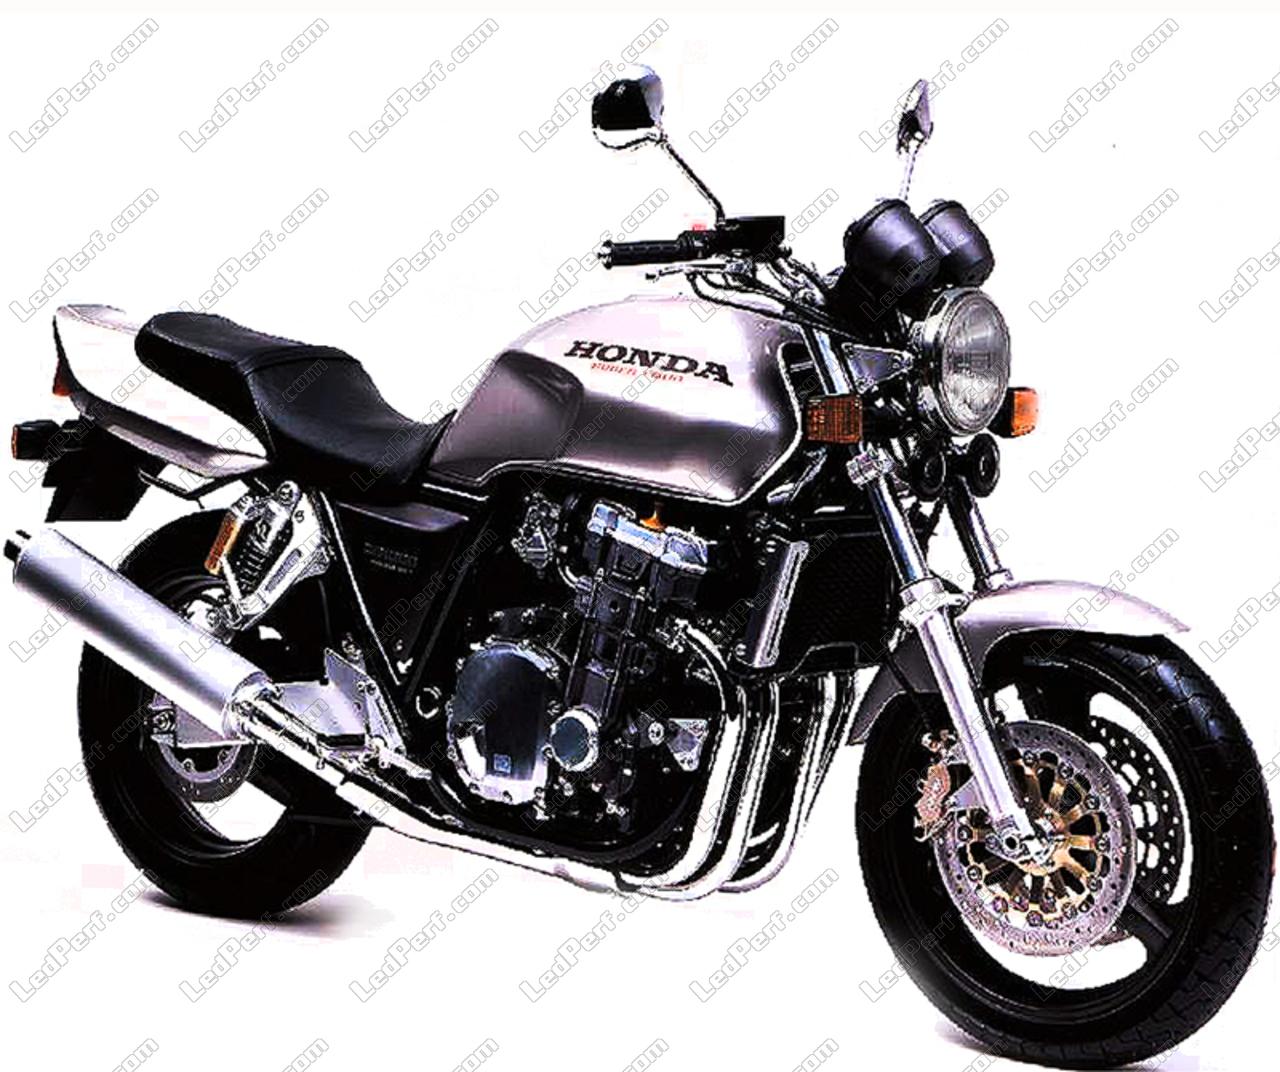 additional led headlights for motorcycle honda cb 1000 big one. Black Bedroom Furniture Sets. Home Design Ideas